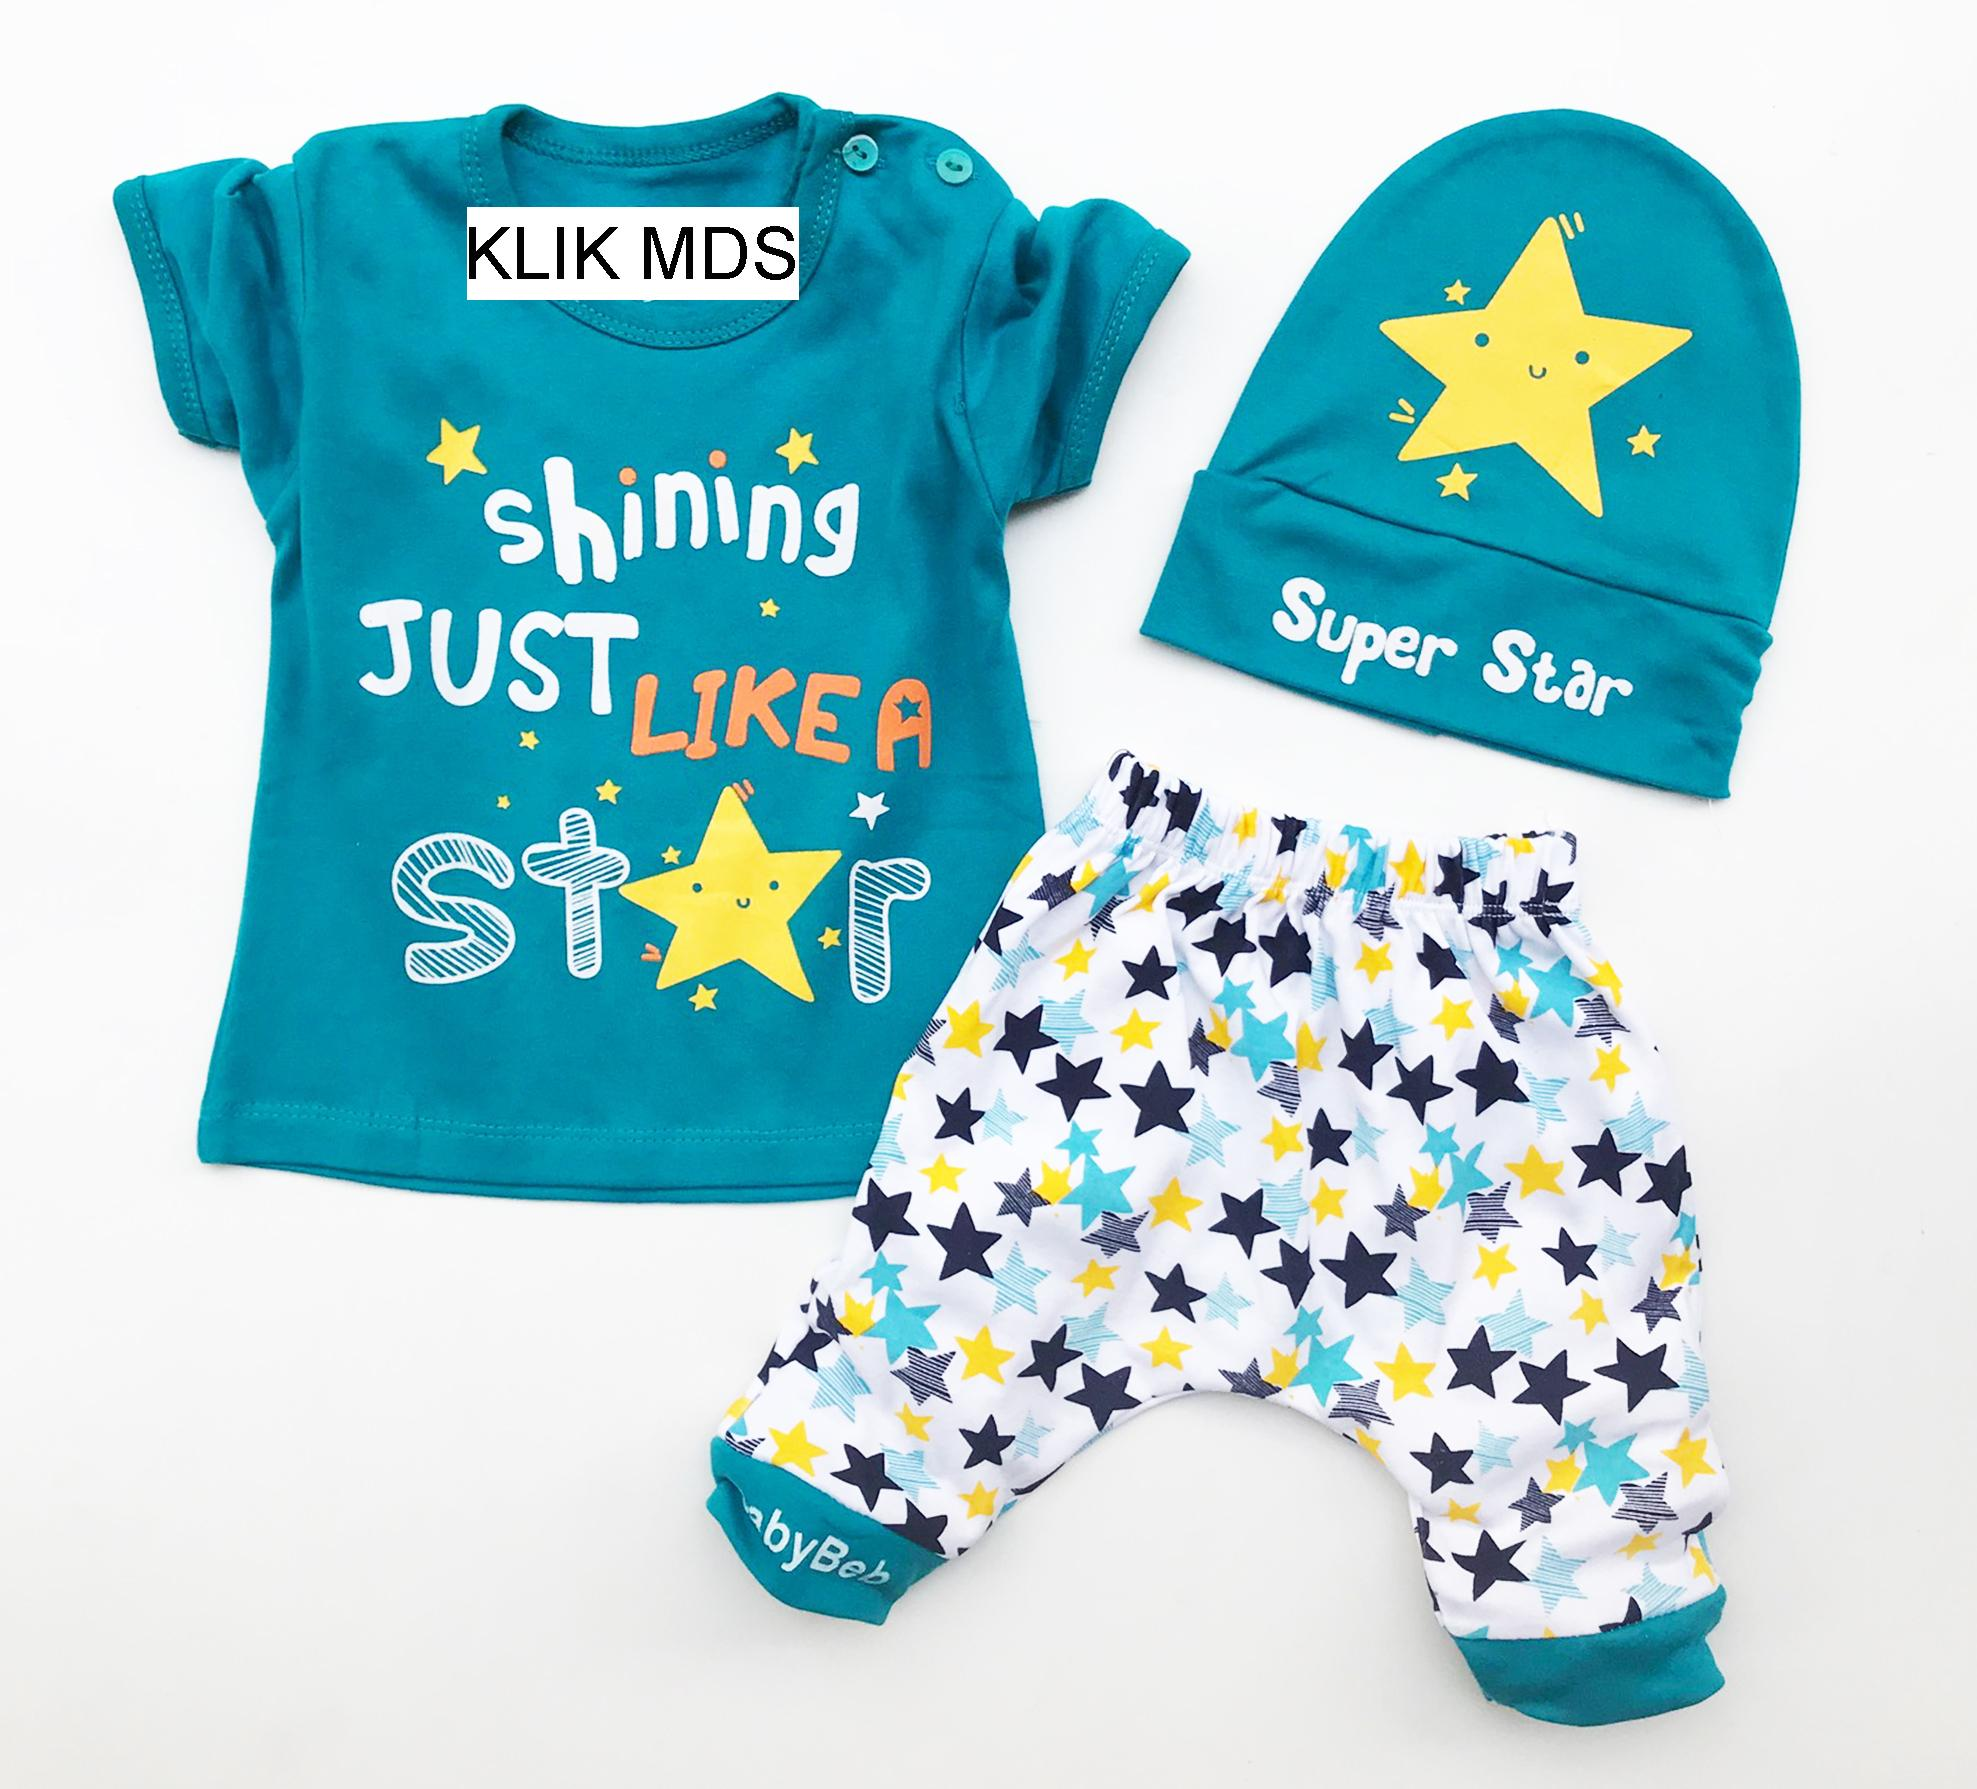 Pakaian Bayi Laki Baju Karakter Klik Mds Anak Setelan Atasan Dan Celana Motif Shining Just Like A Star